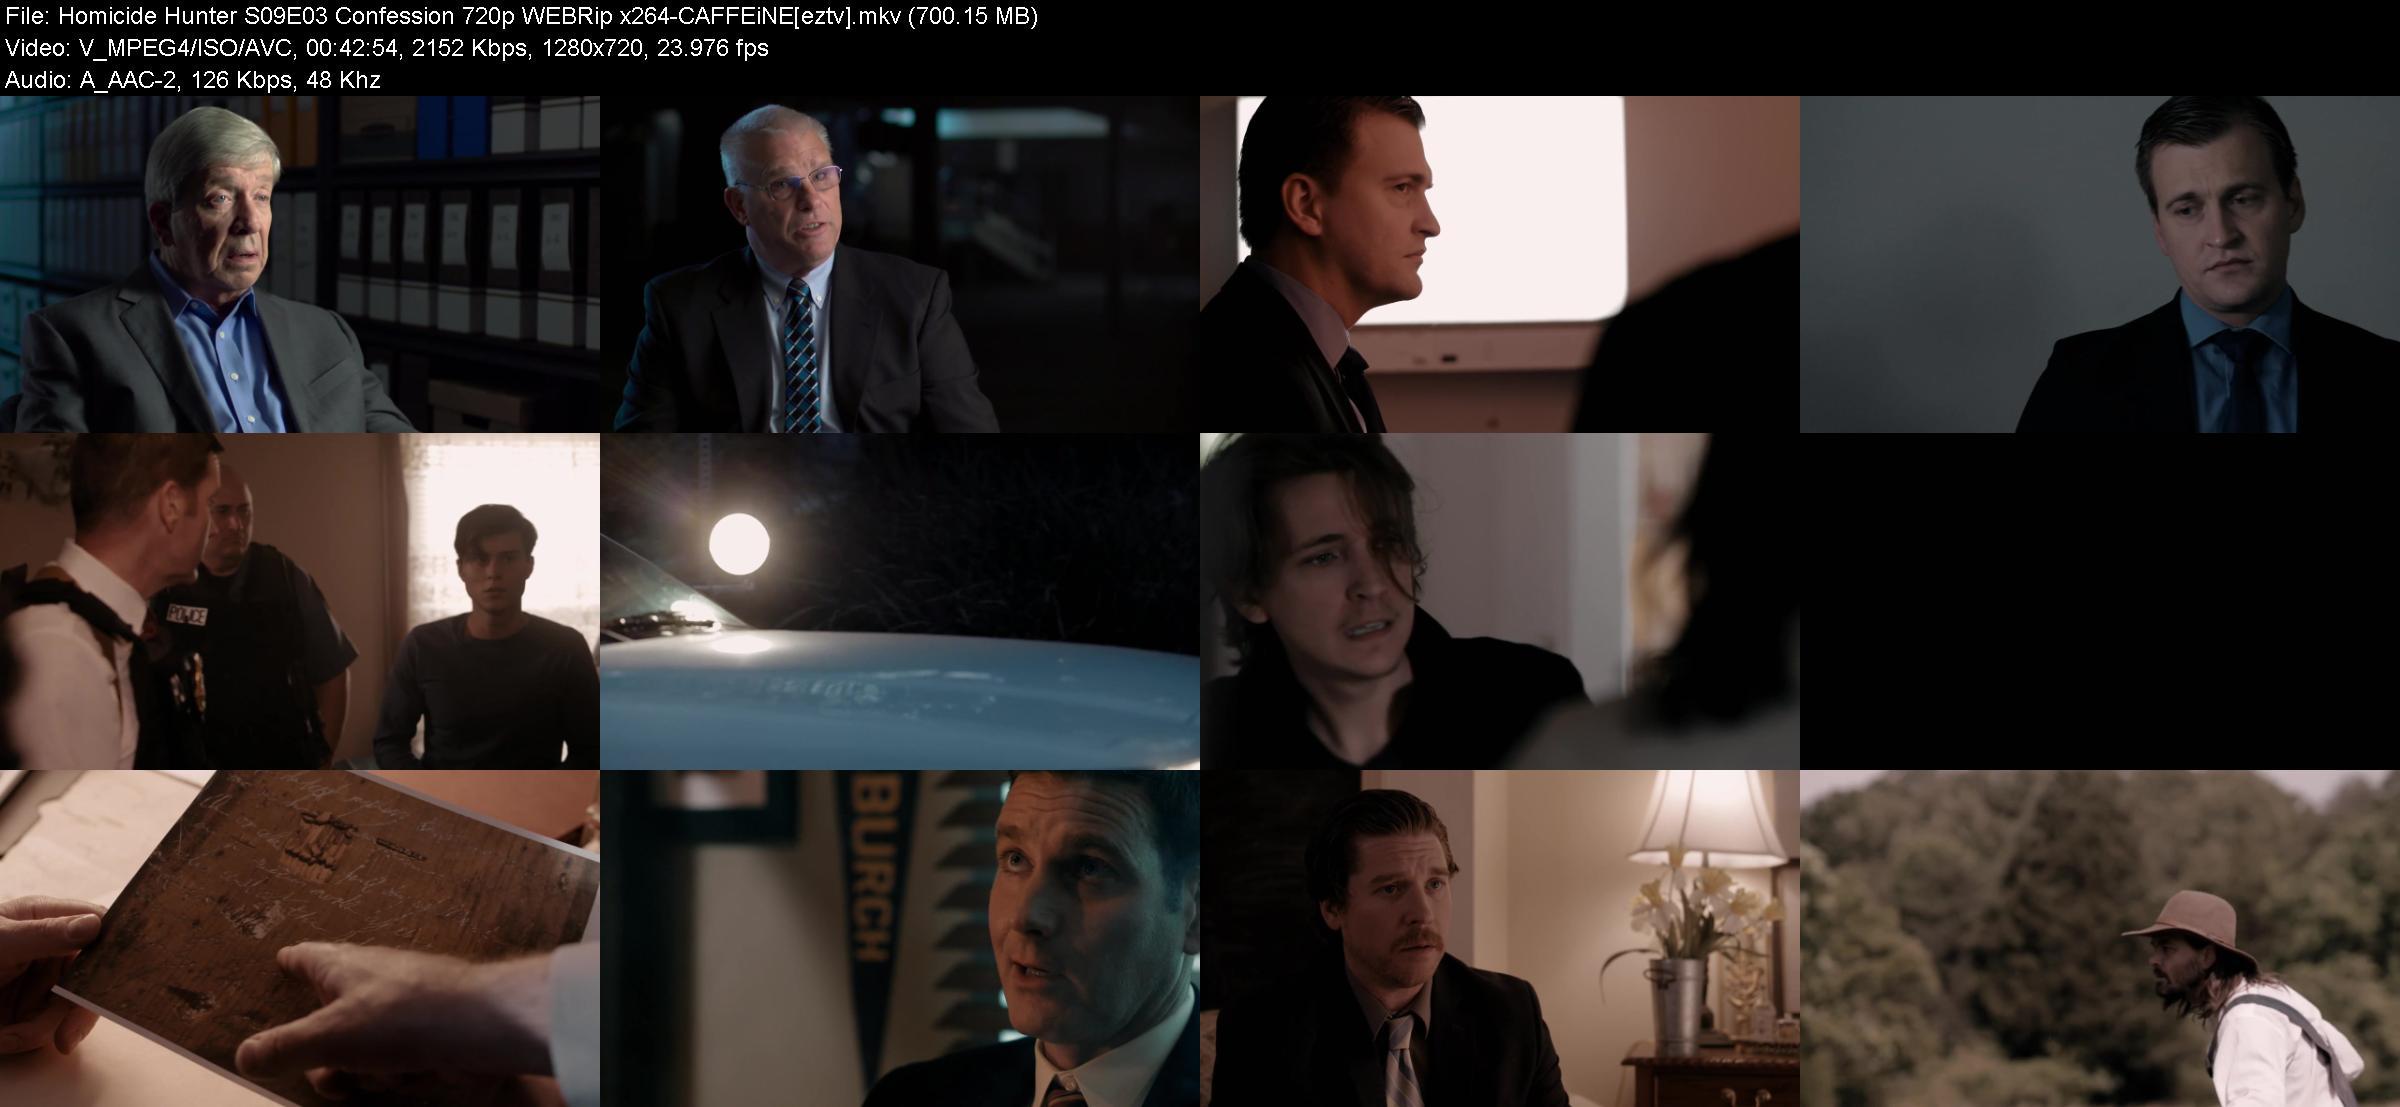 Homicide Hunter S09E03 Confession 720p WEBRip x264-CAFFEiNE